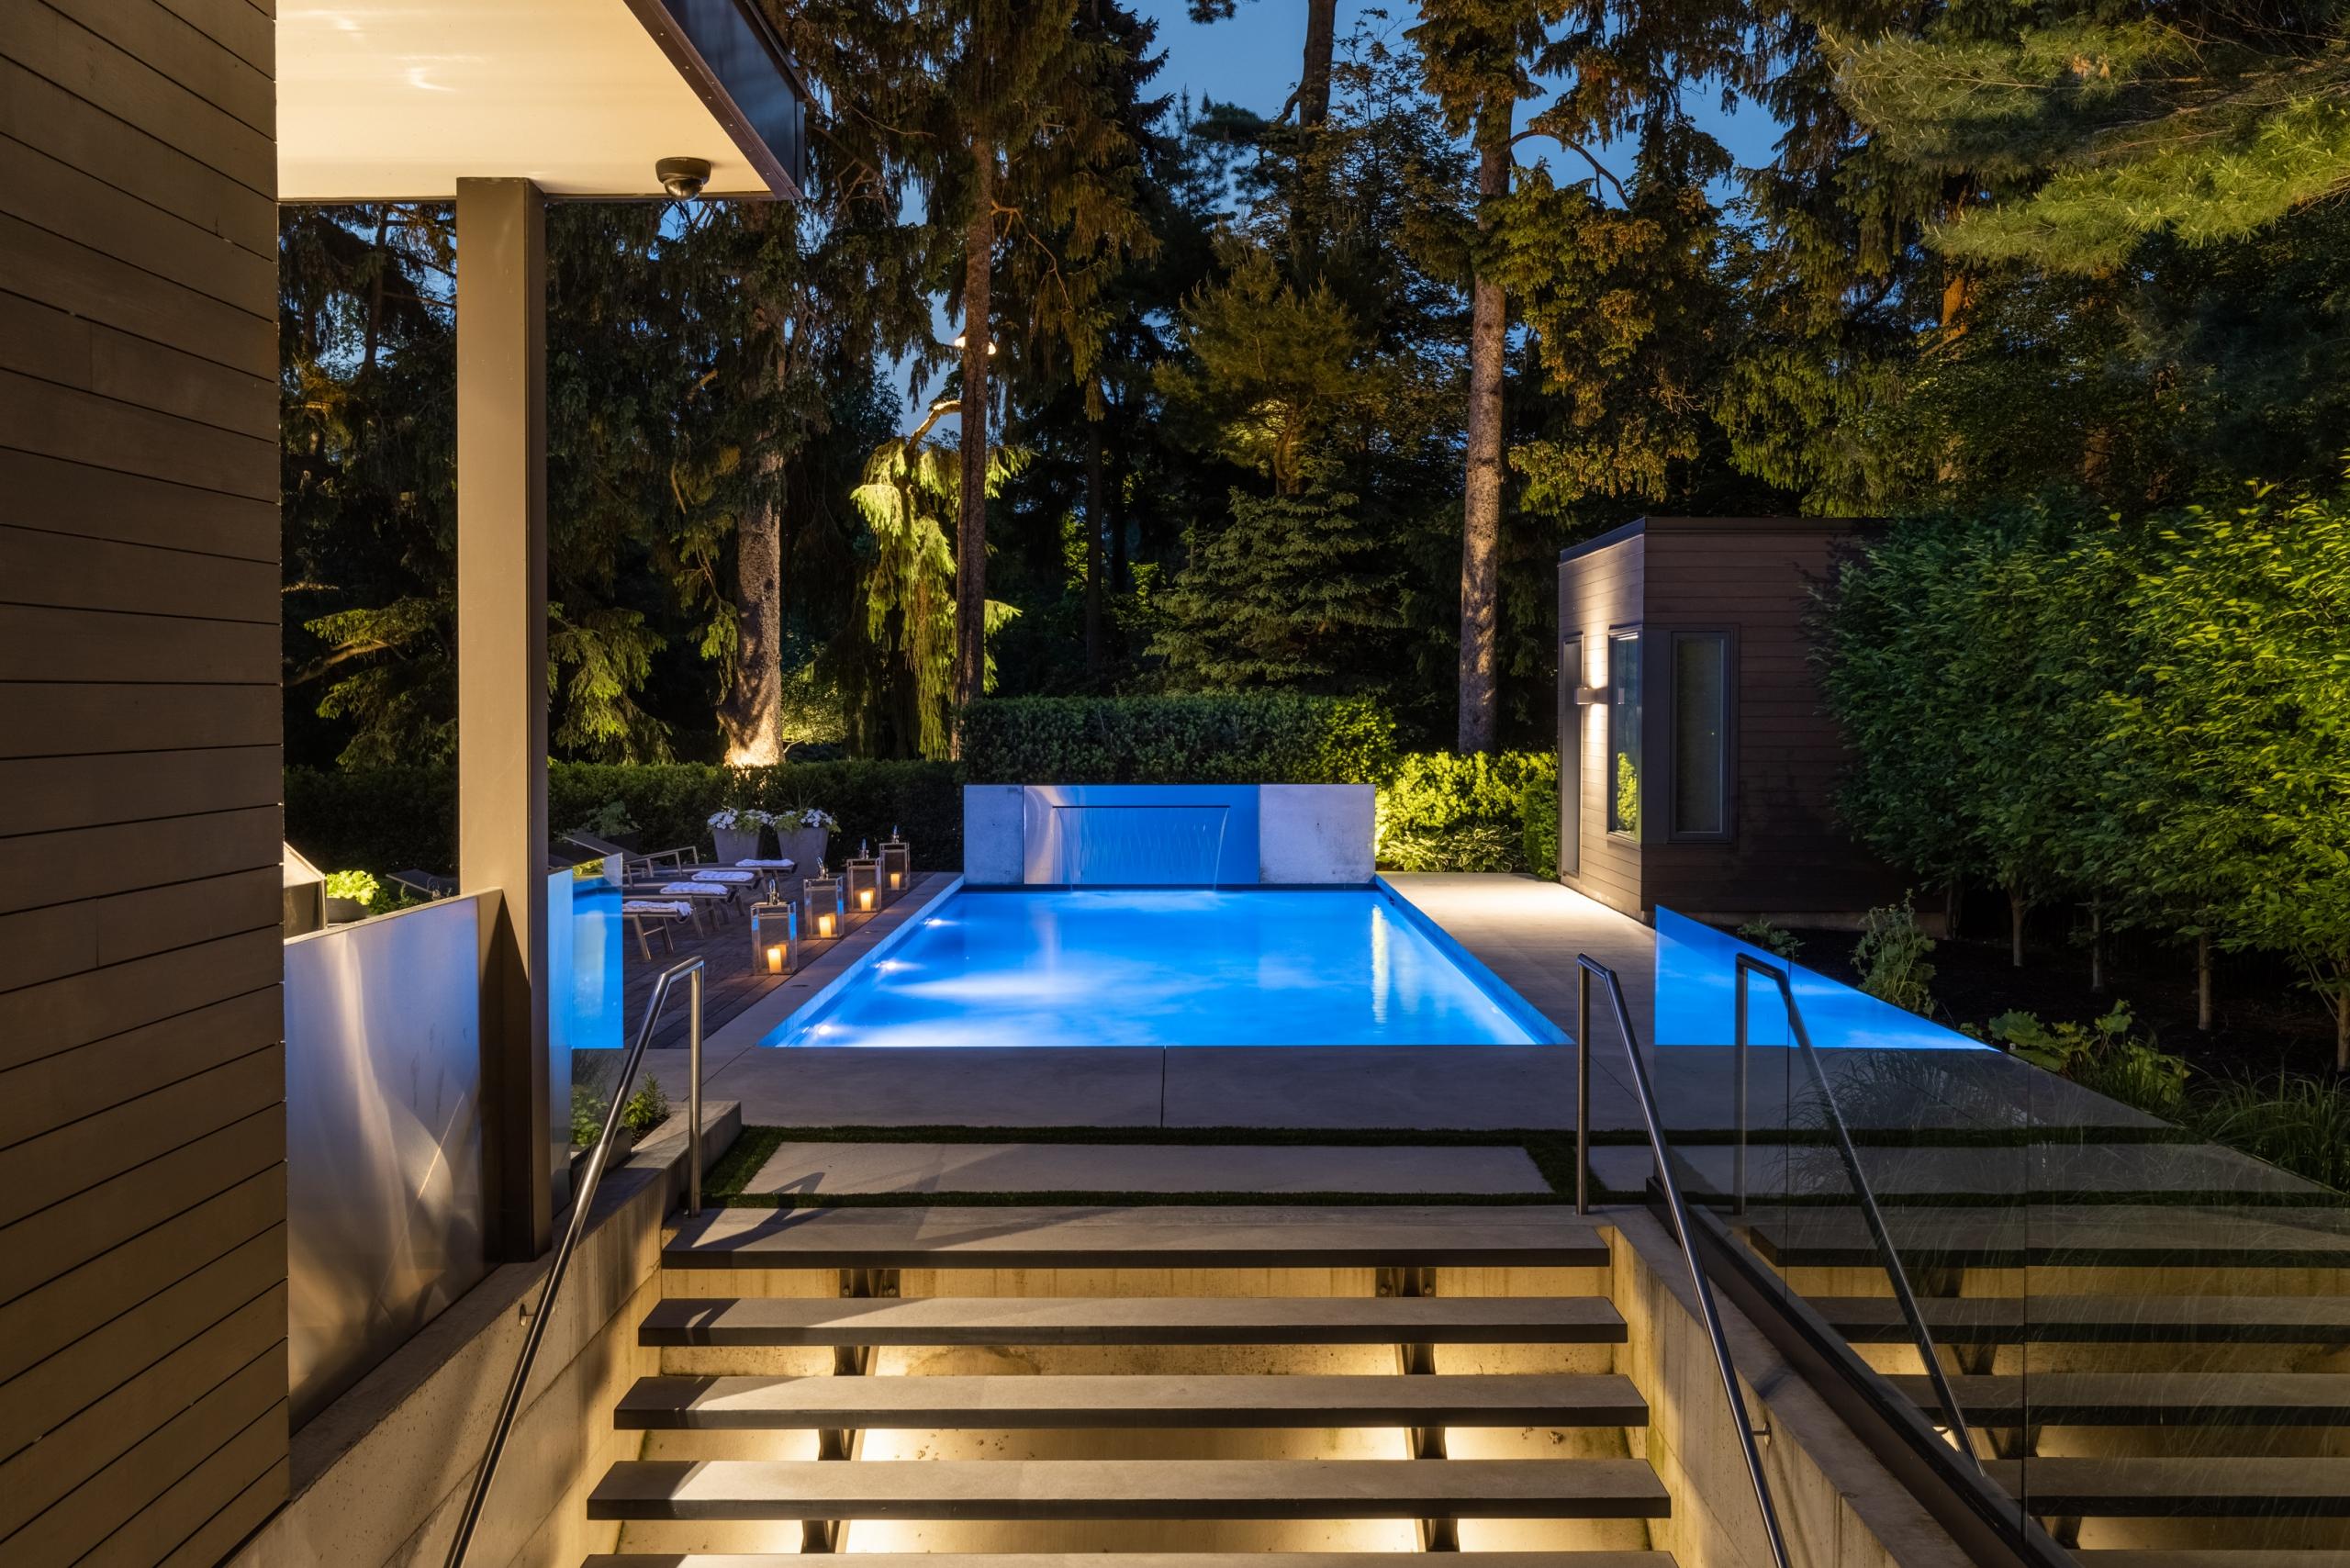 Swimming pool featured at 65 Cox Drive, Oakville at Alex Irish & Associates